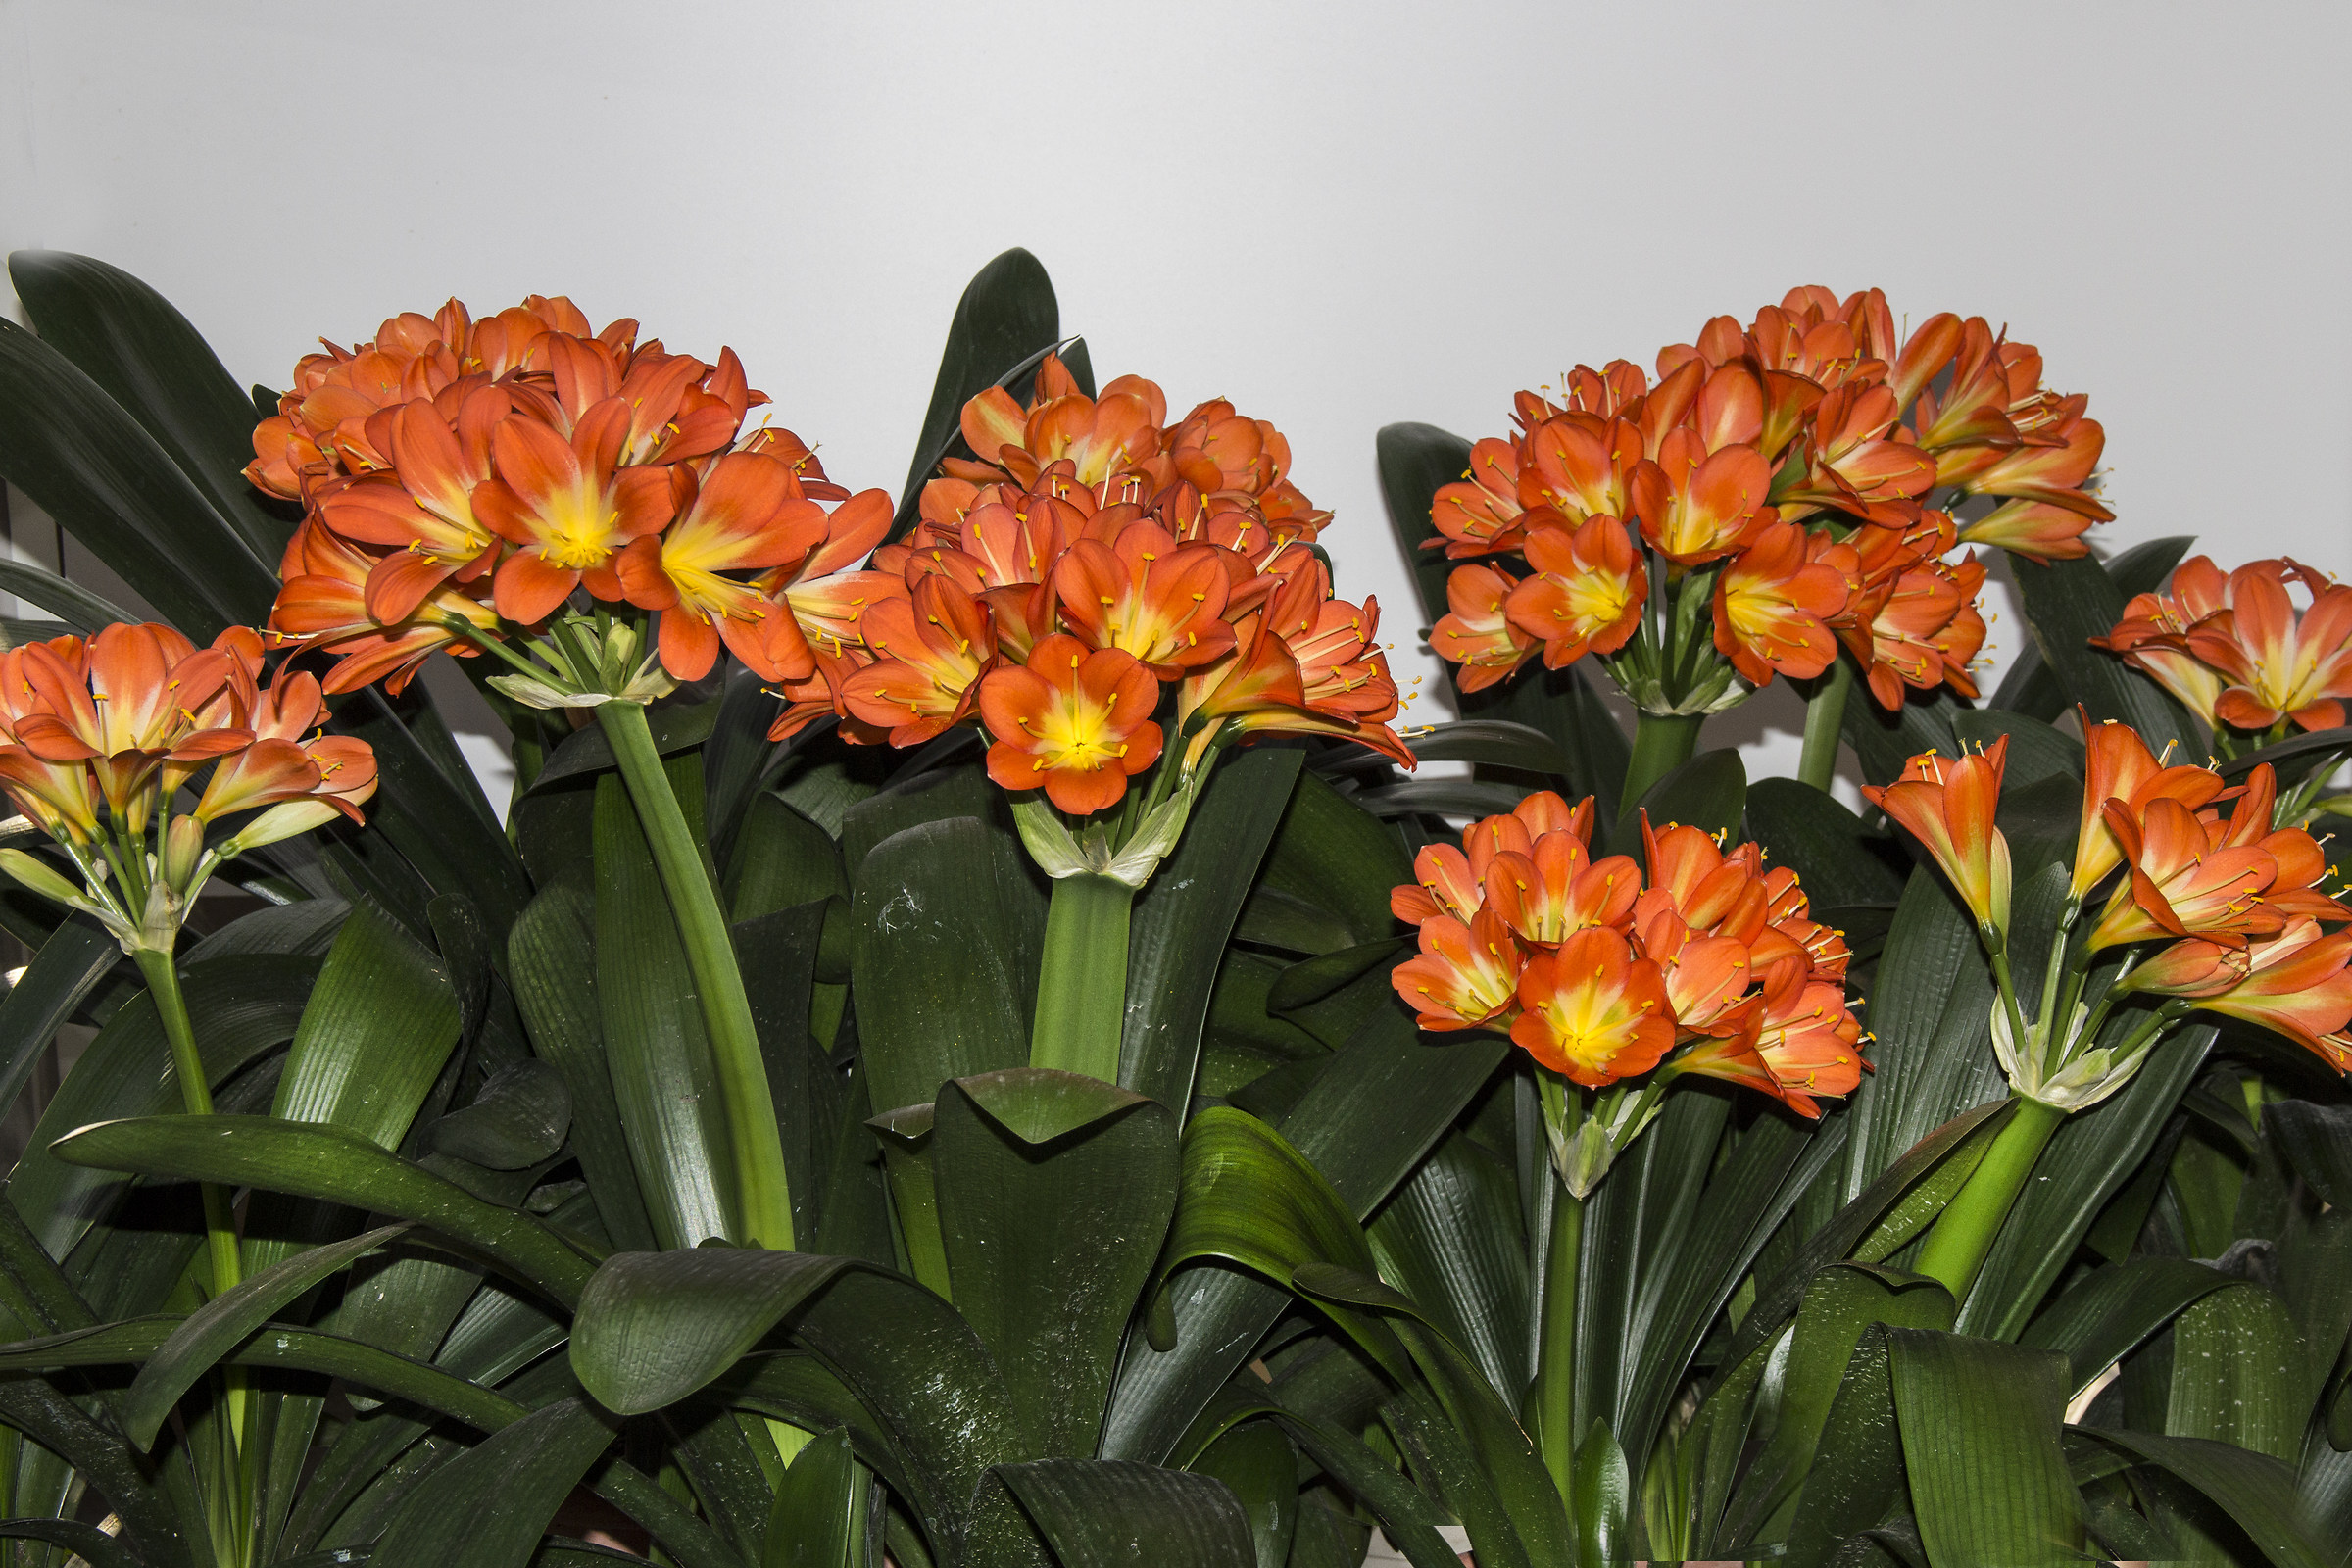 Clivia in full bloom...